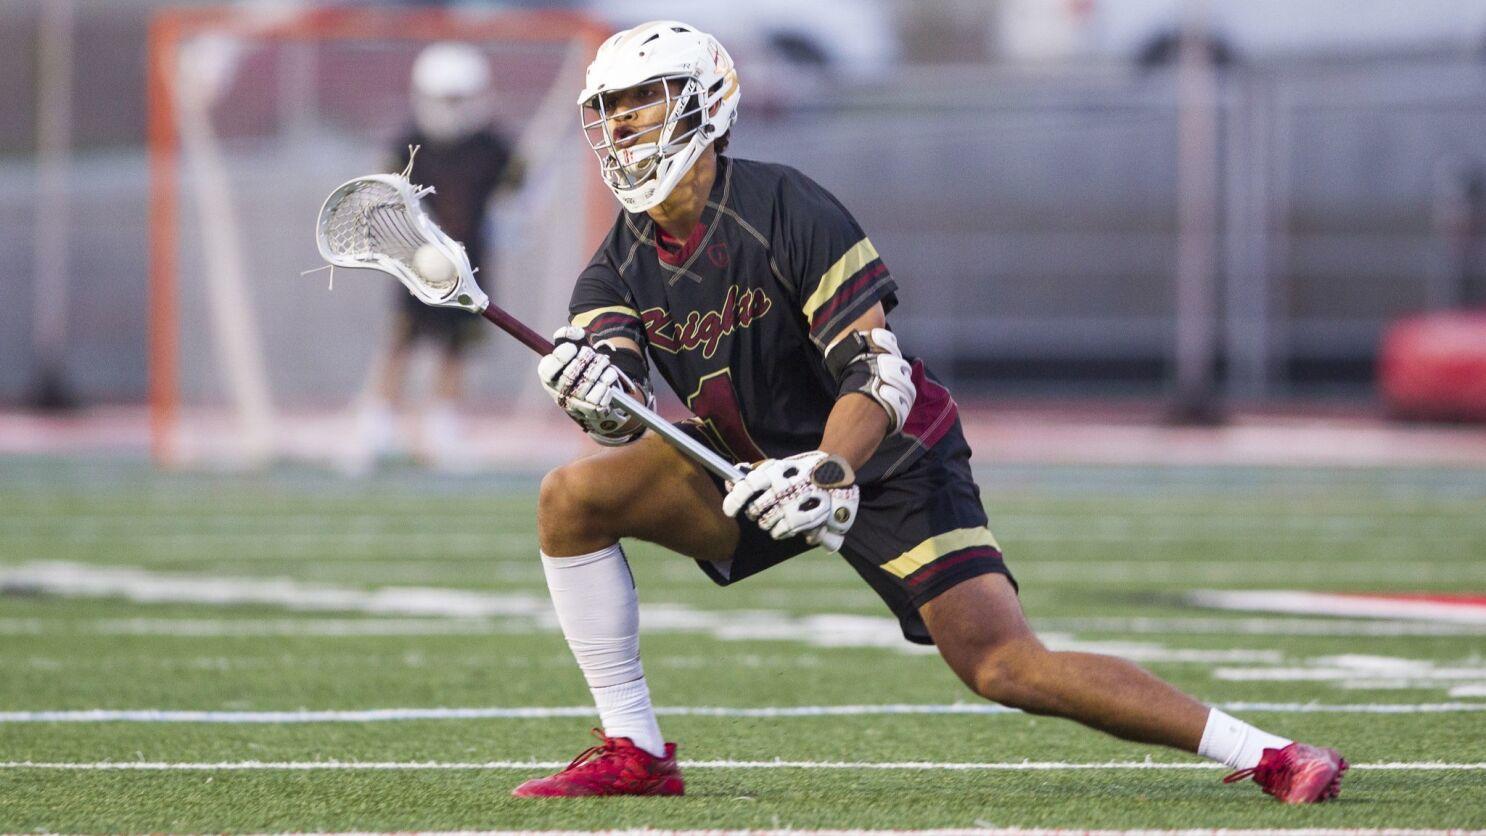 Boys lacrosse preview: top players, season story lines, rankings